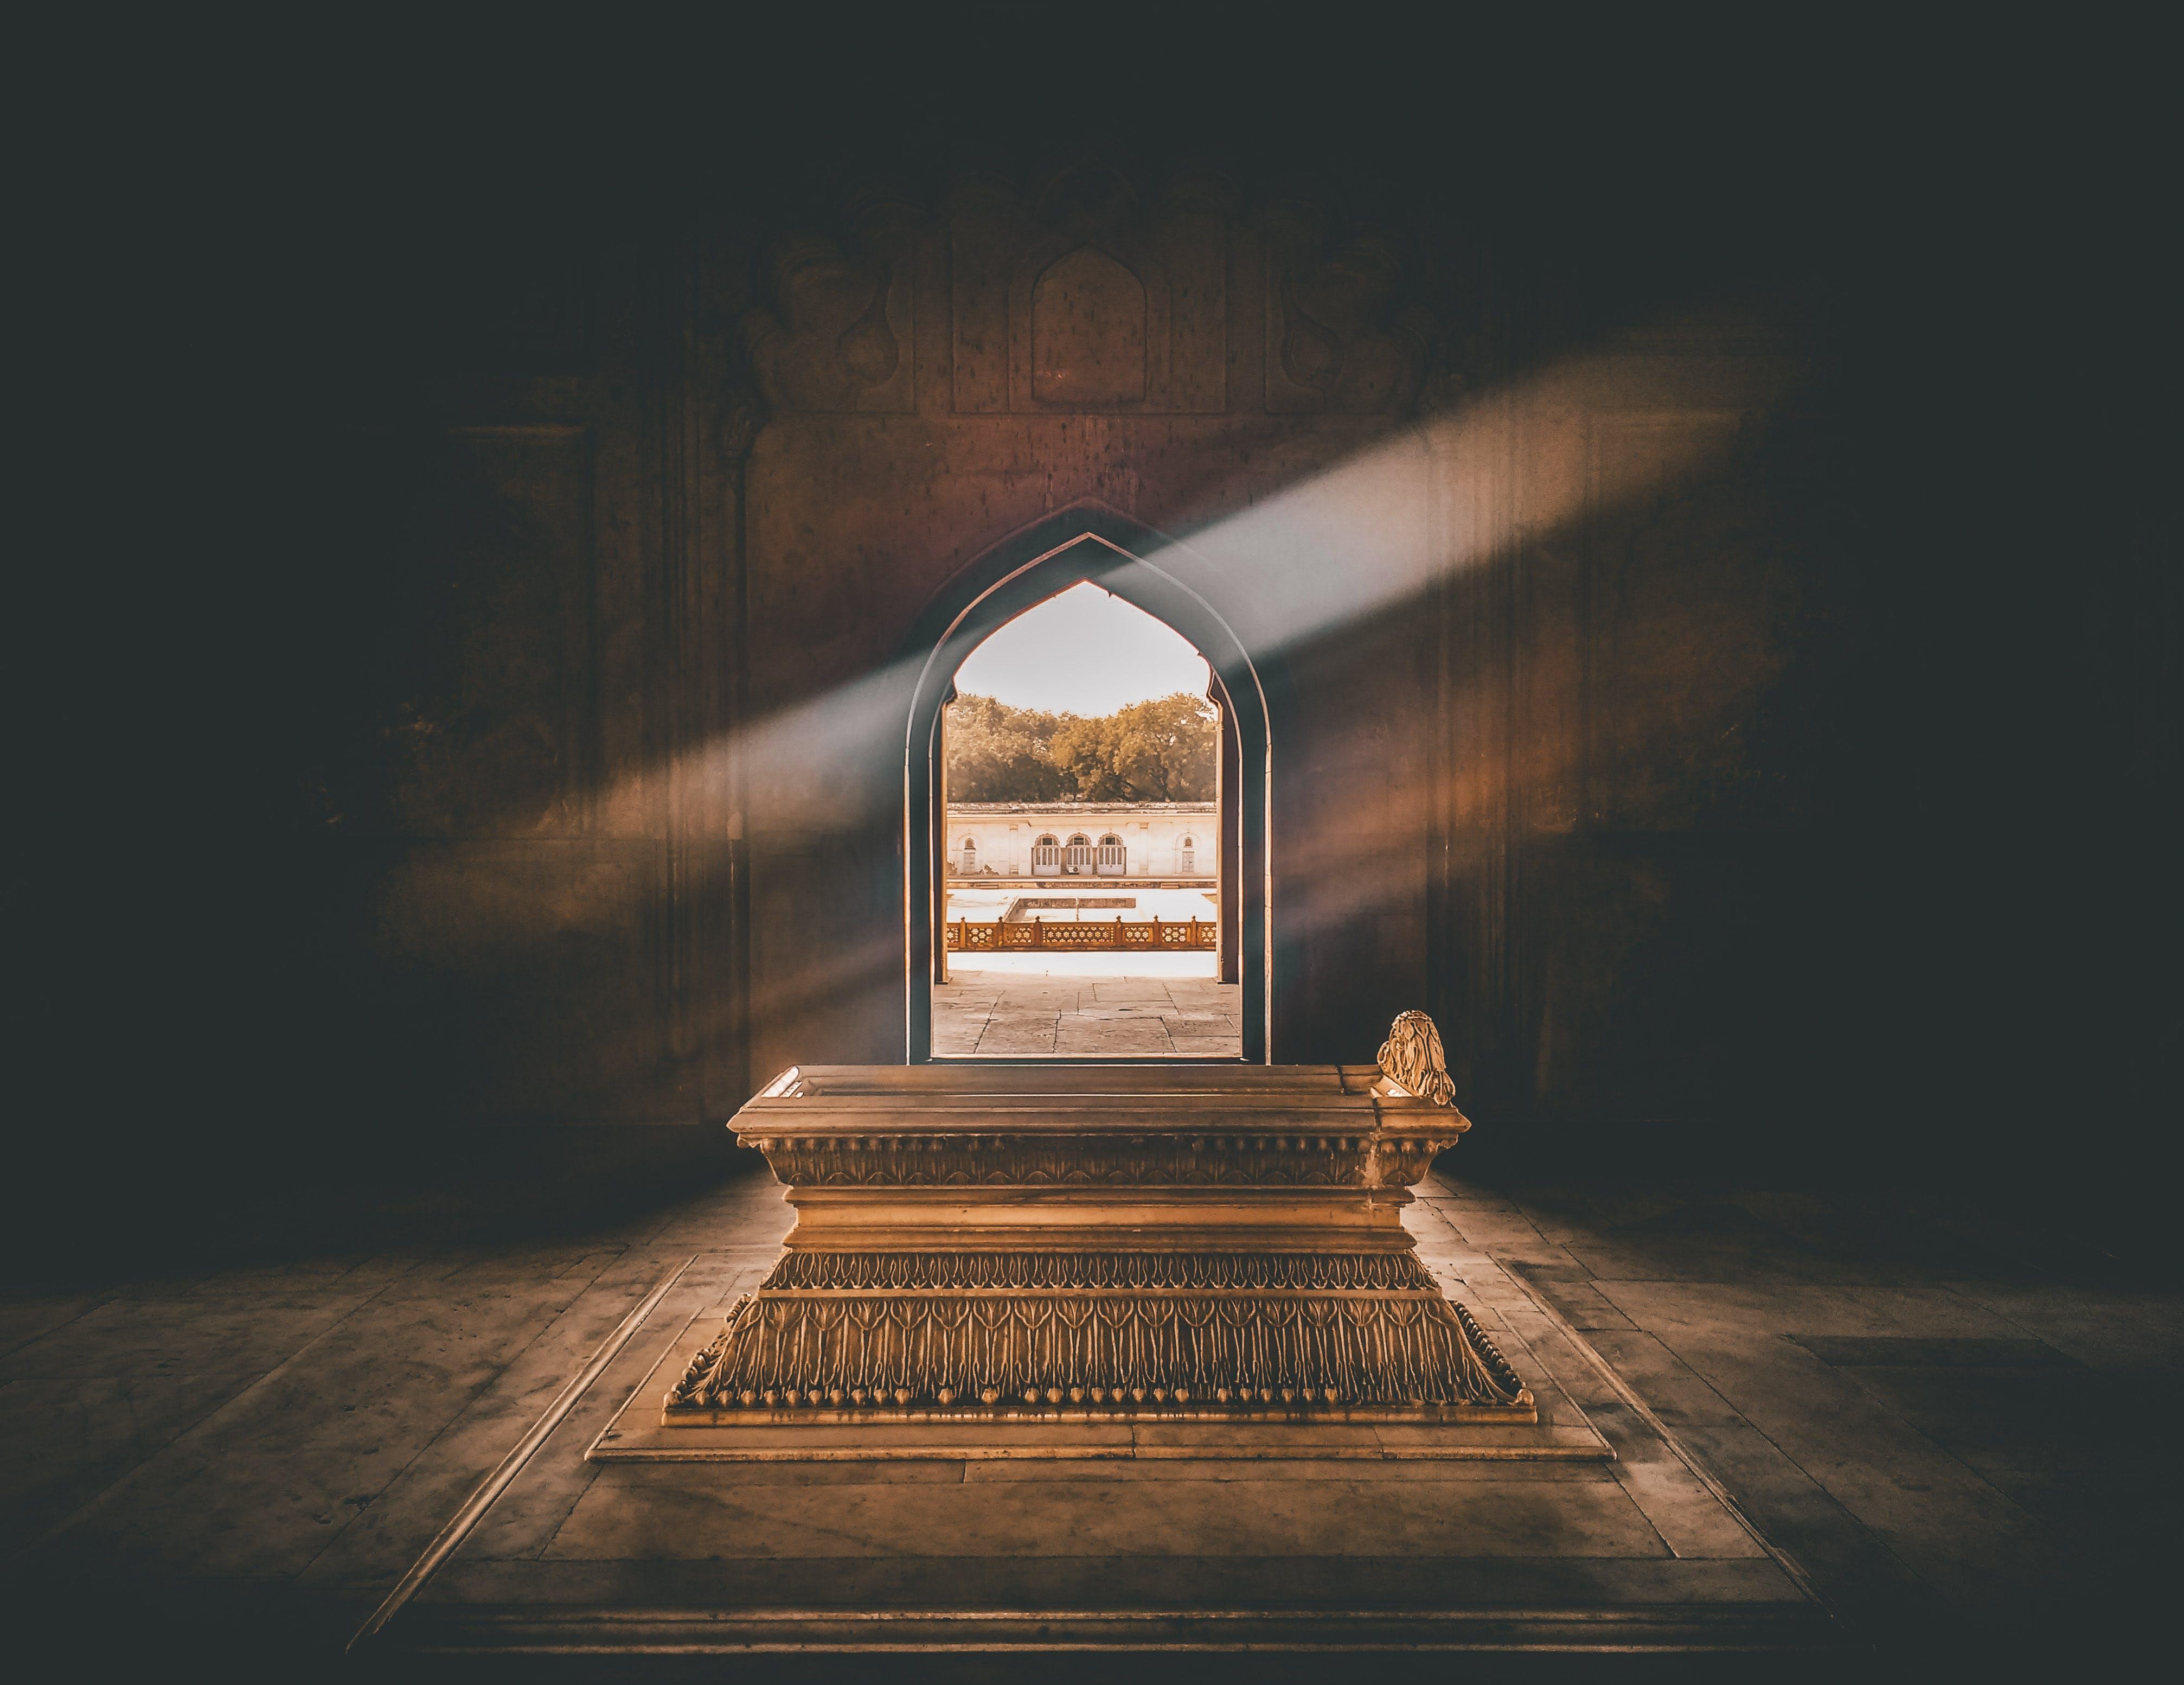 Hindistan, mezar, mimari, tabut içeren Ücretsiz stok fotoğraf